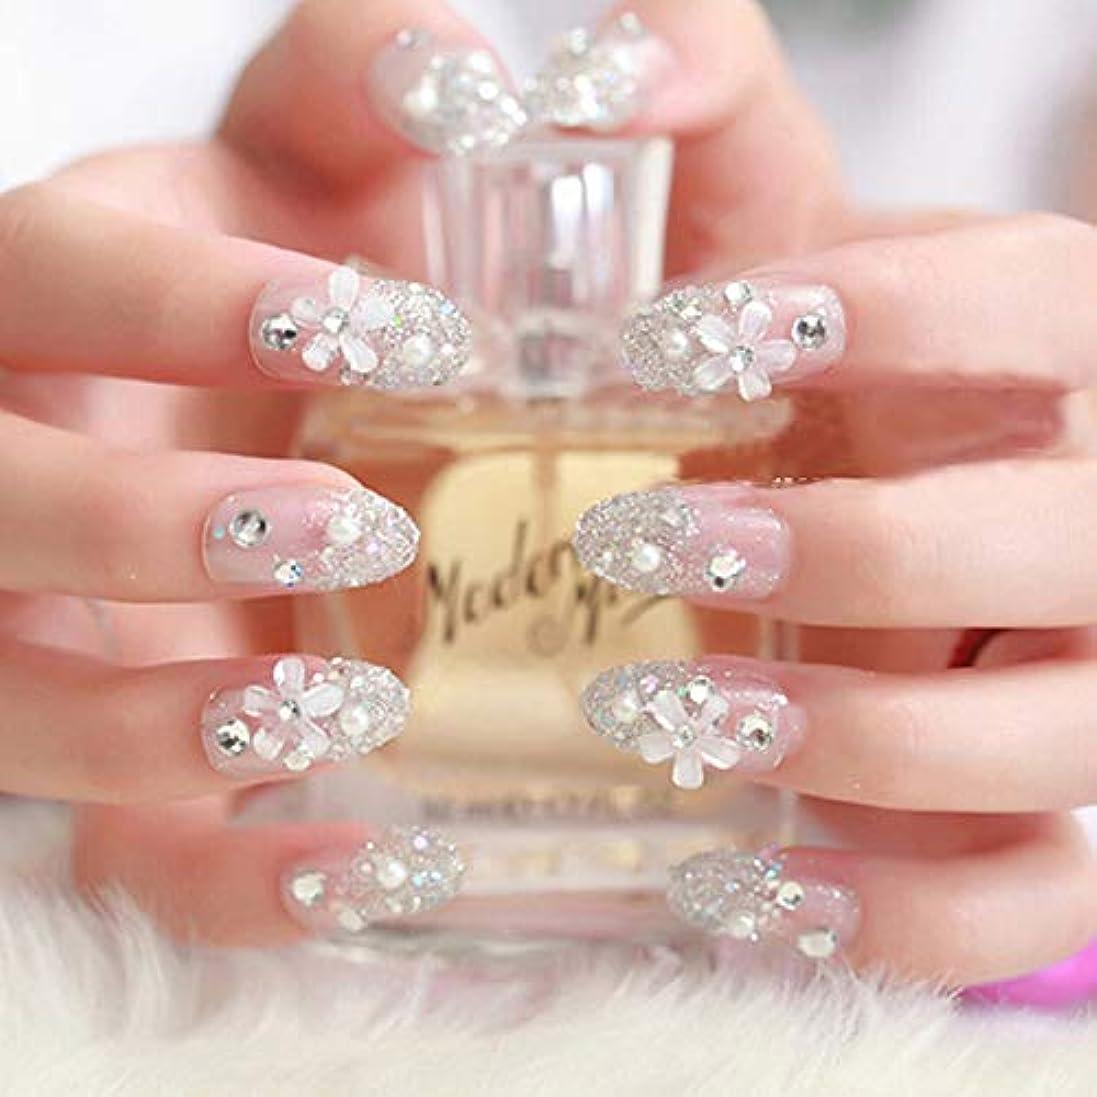 XUTXZKA 24個/セット人工花嫁ネイル、ウェディングダイヤモンドフィンガーフェイクネイルのヒント